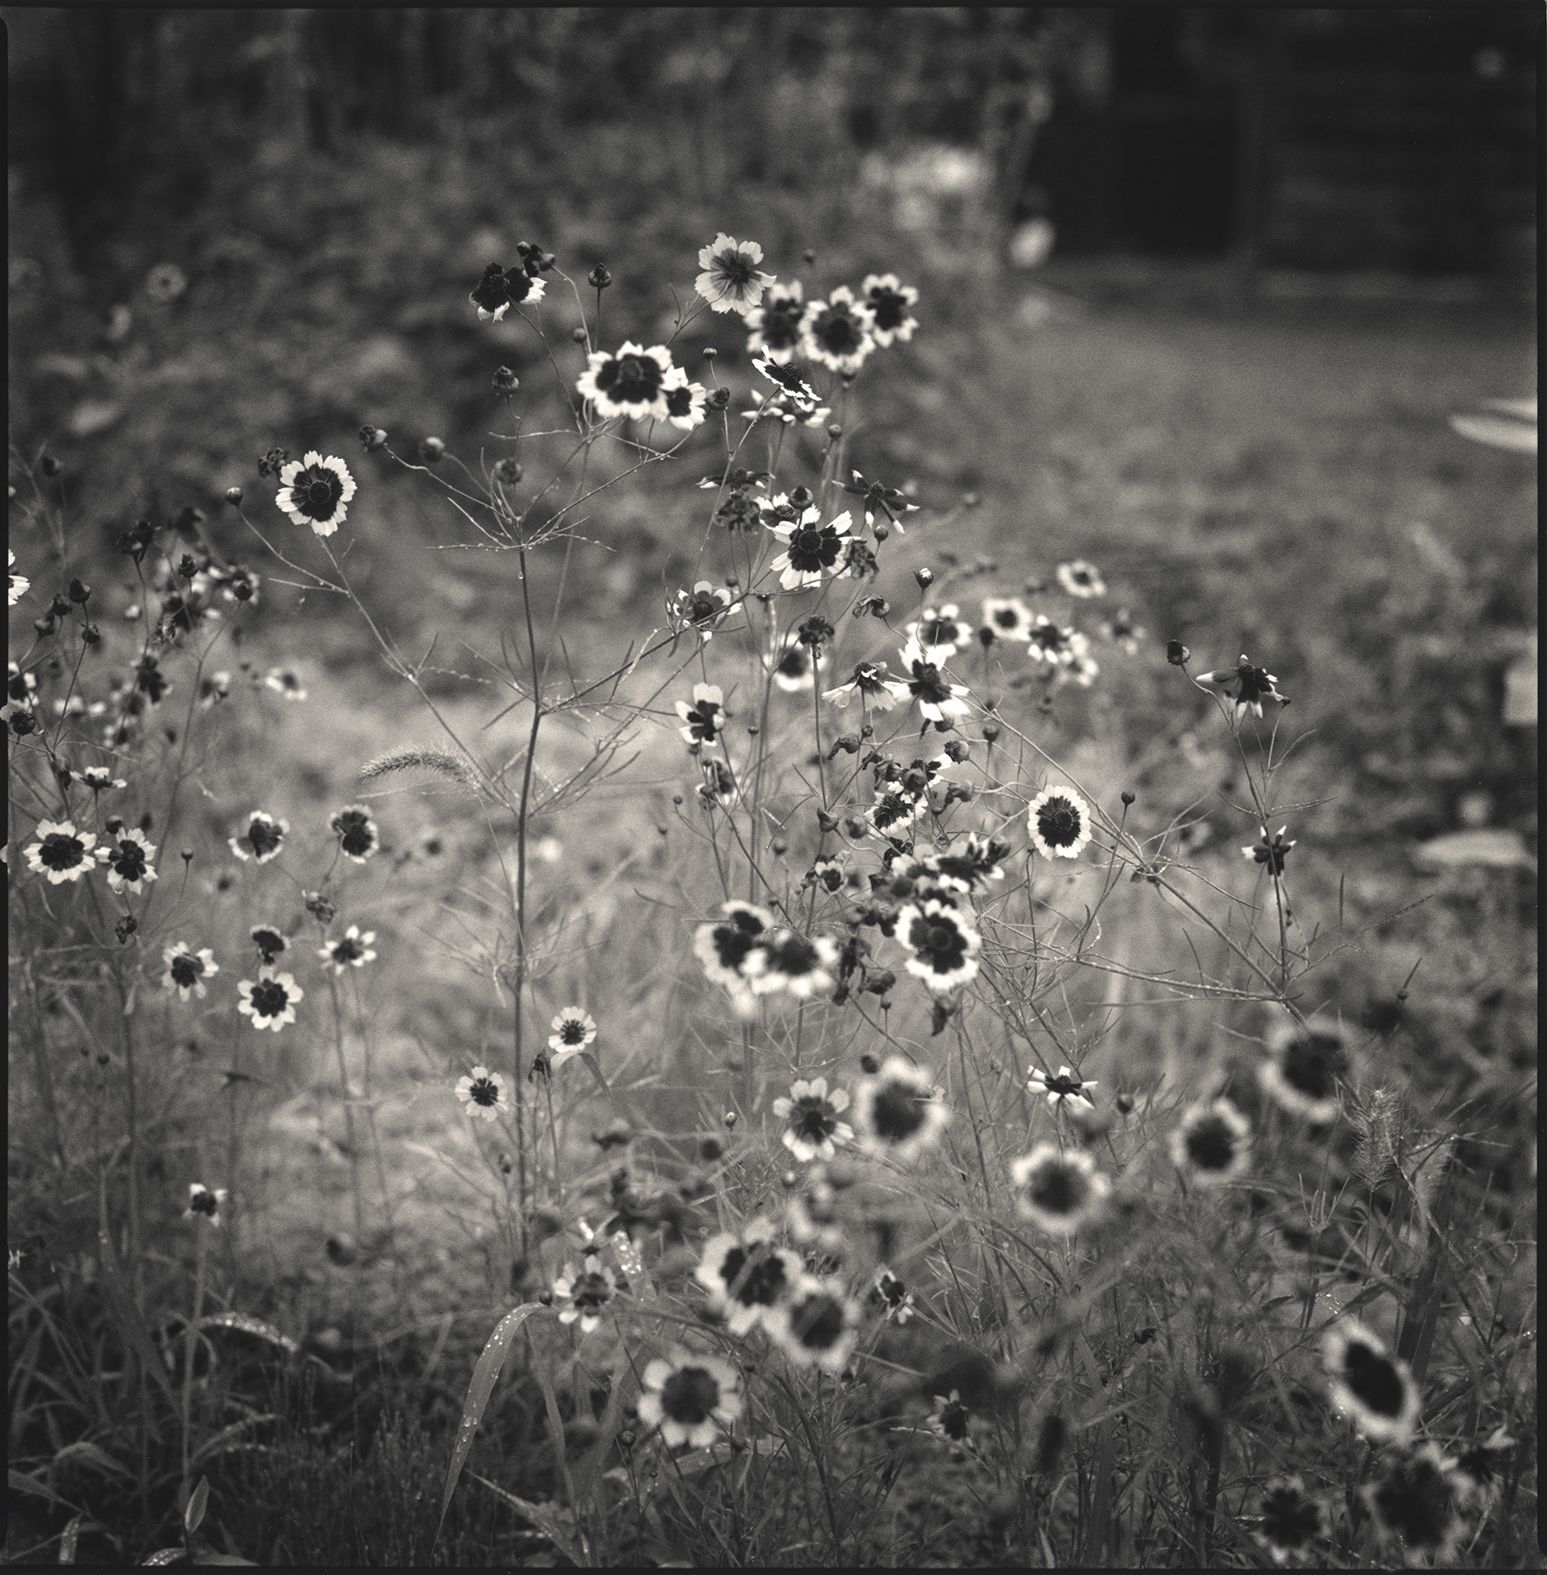 Hiroshi Watanabe, Field Flowers, Kwaidan